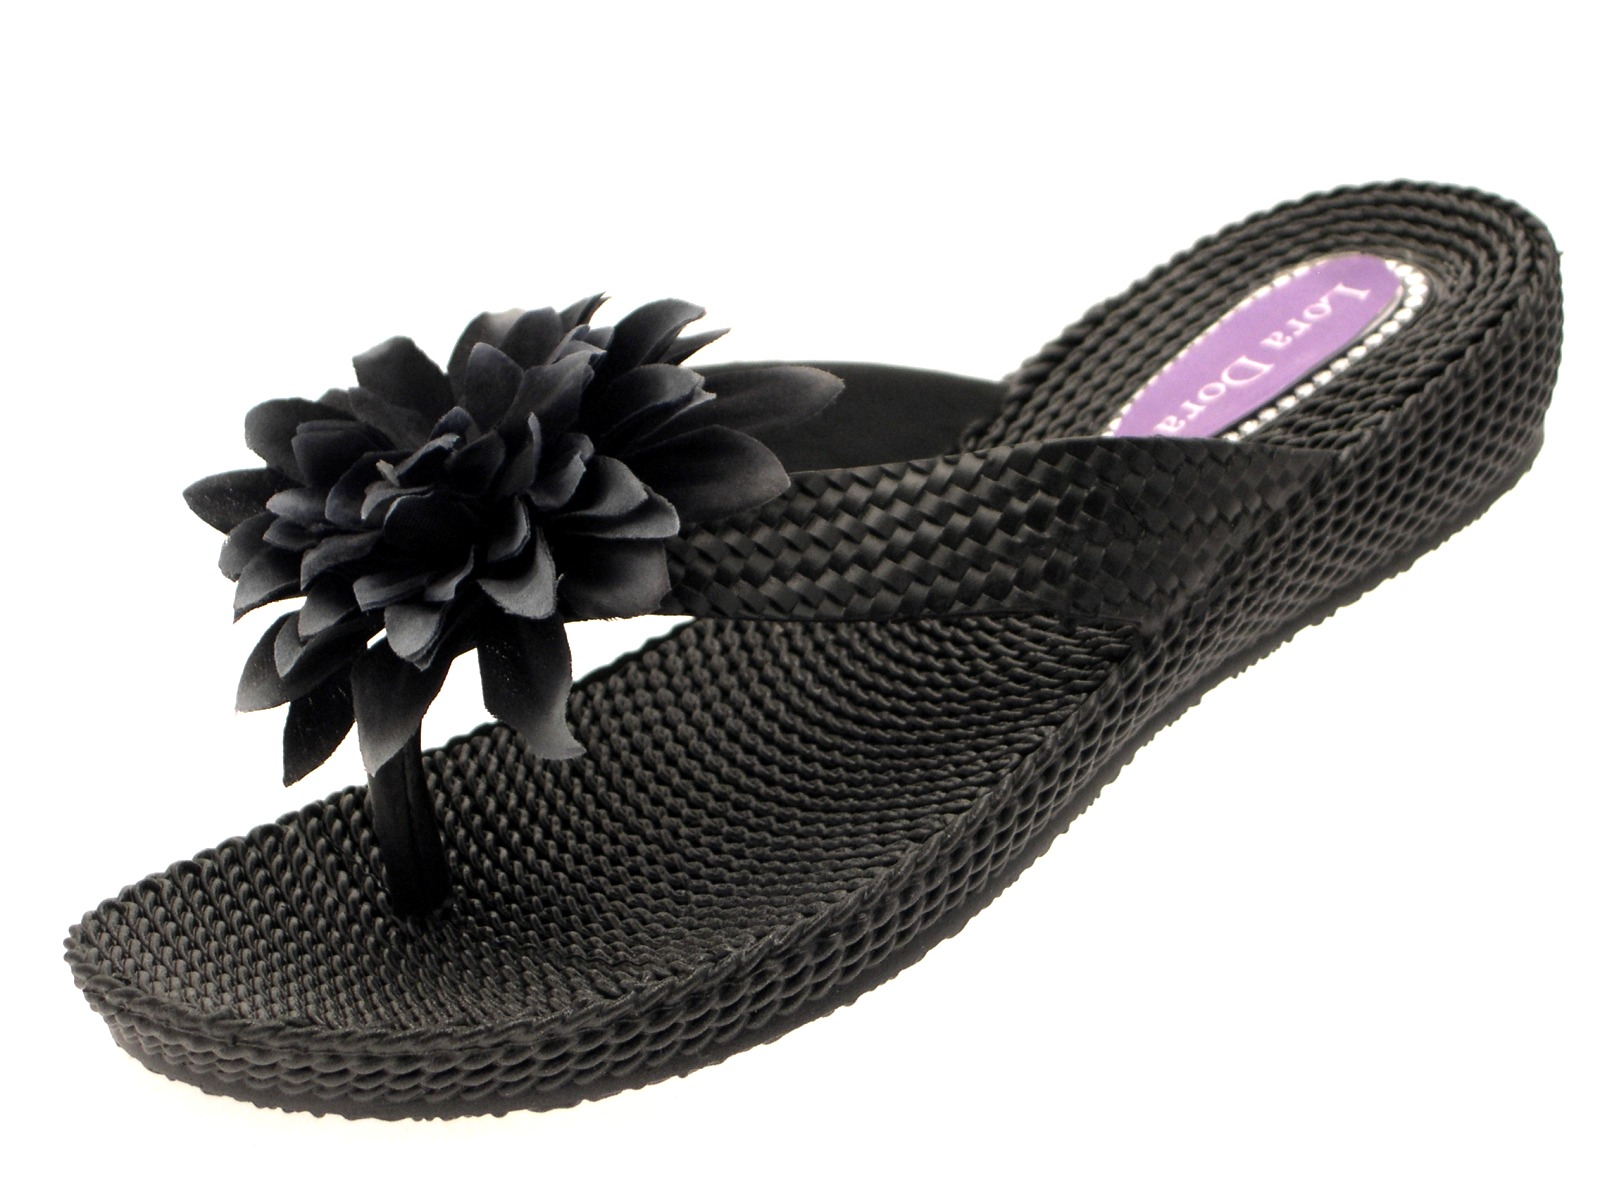 bcb78f7af07b Womens Eva Low Wedge Flip Flops Toe Posts Ladies Summer Beach ...